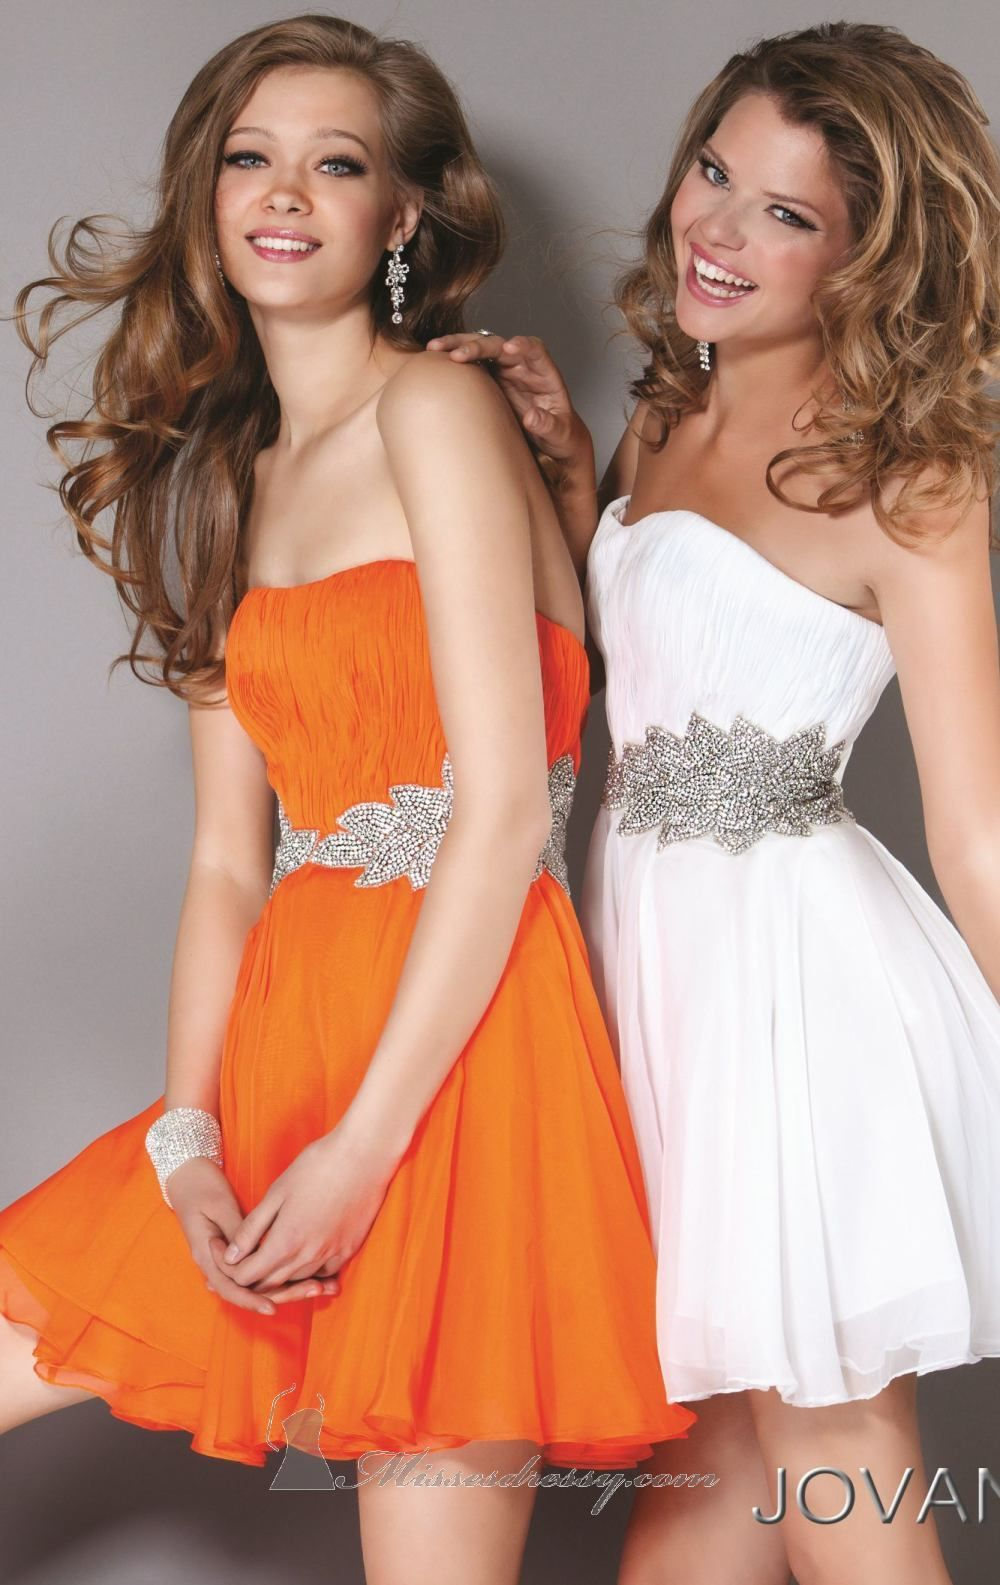 Jovani dress missesdressy available at missesdressy